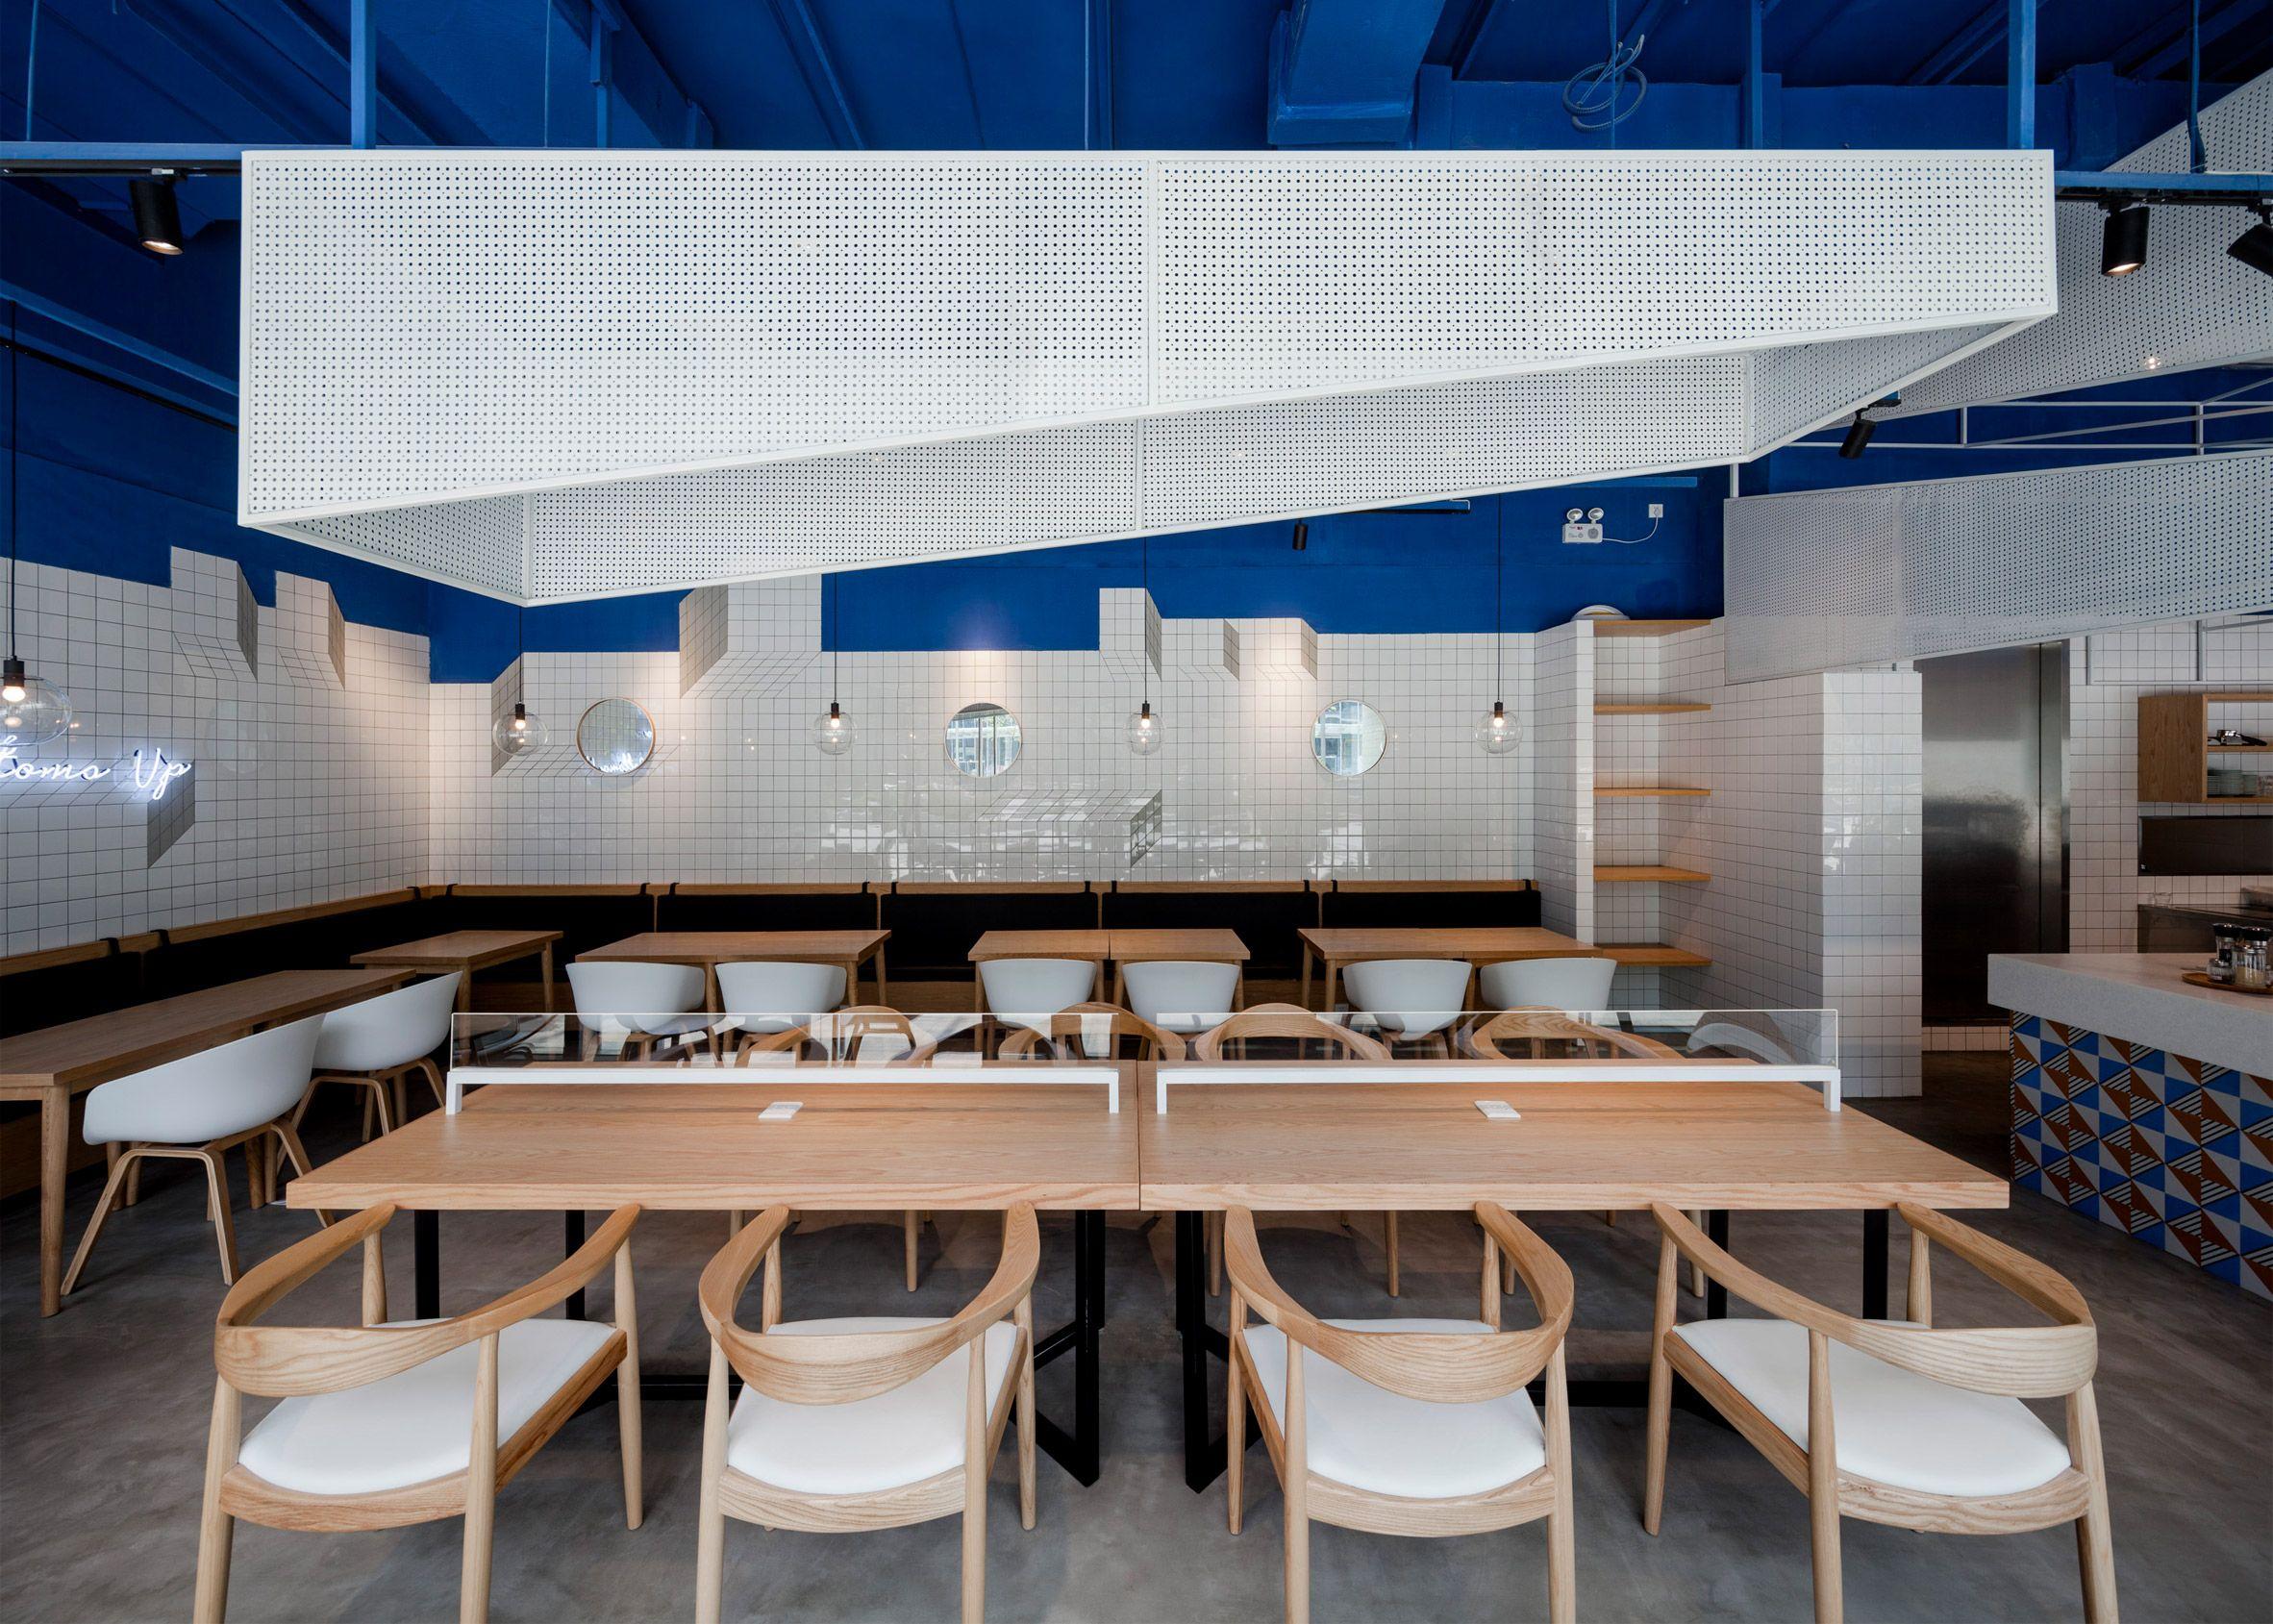 swimming pool studio bases shanghai cafe interior on the mediterranean sea